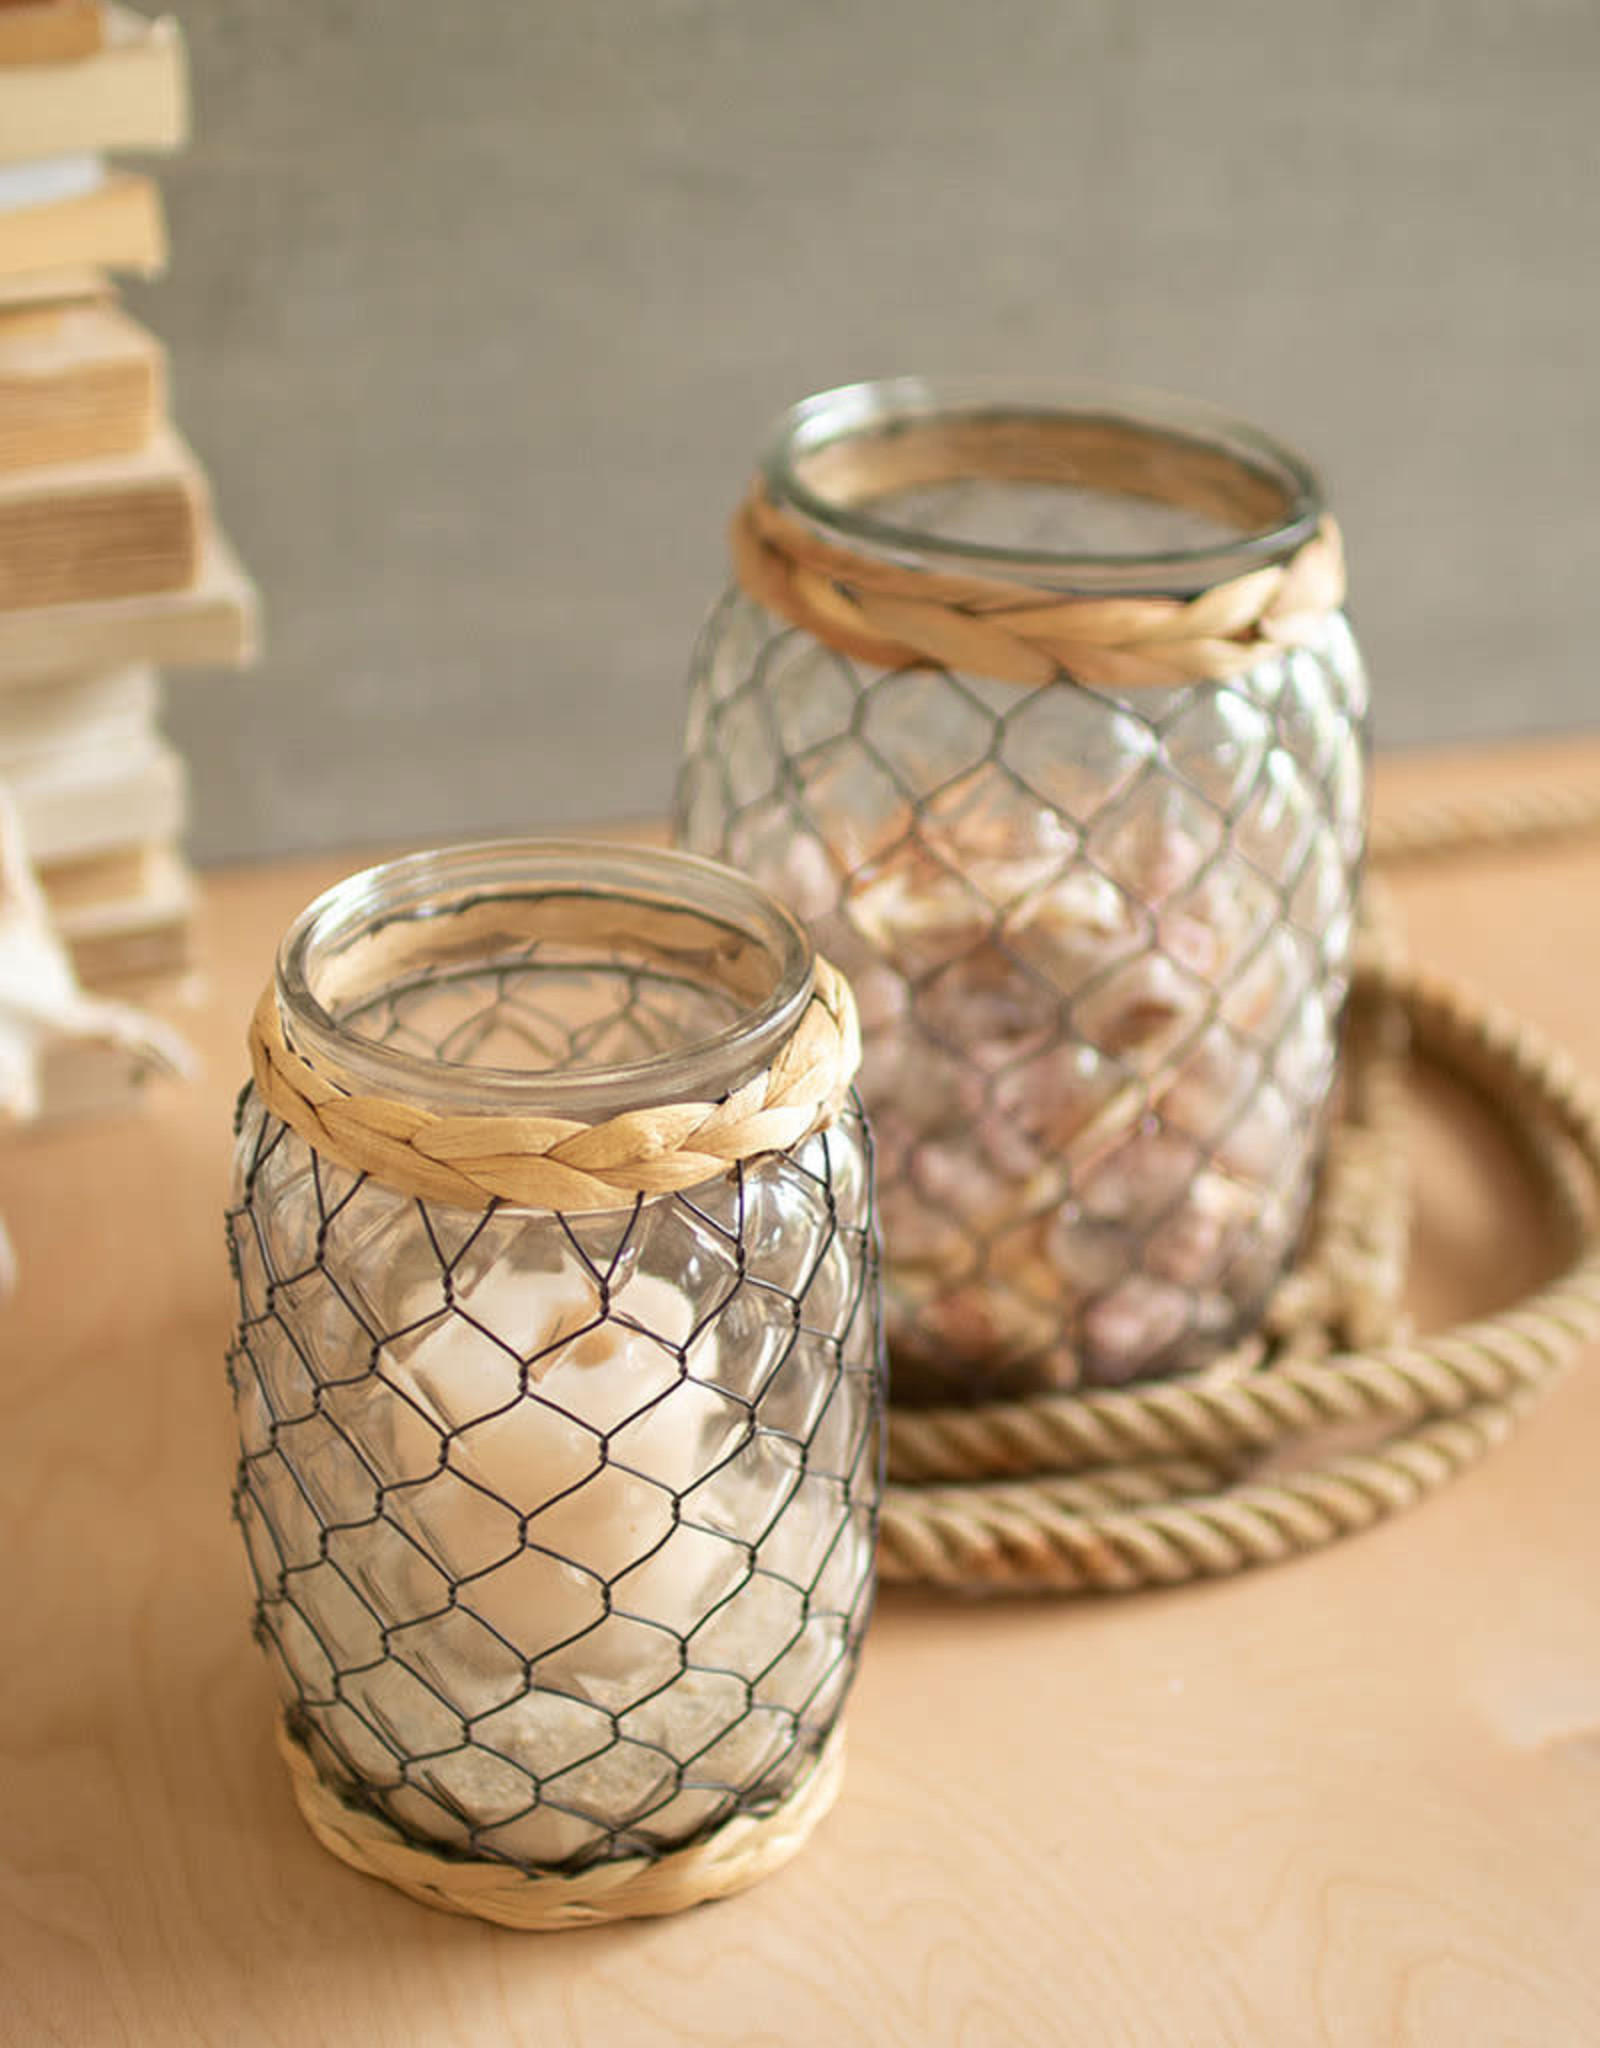 Kalalou wire wrapped vase w/seagrass detail - LG